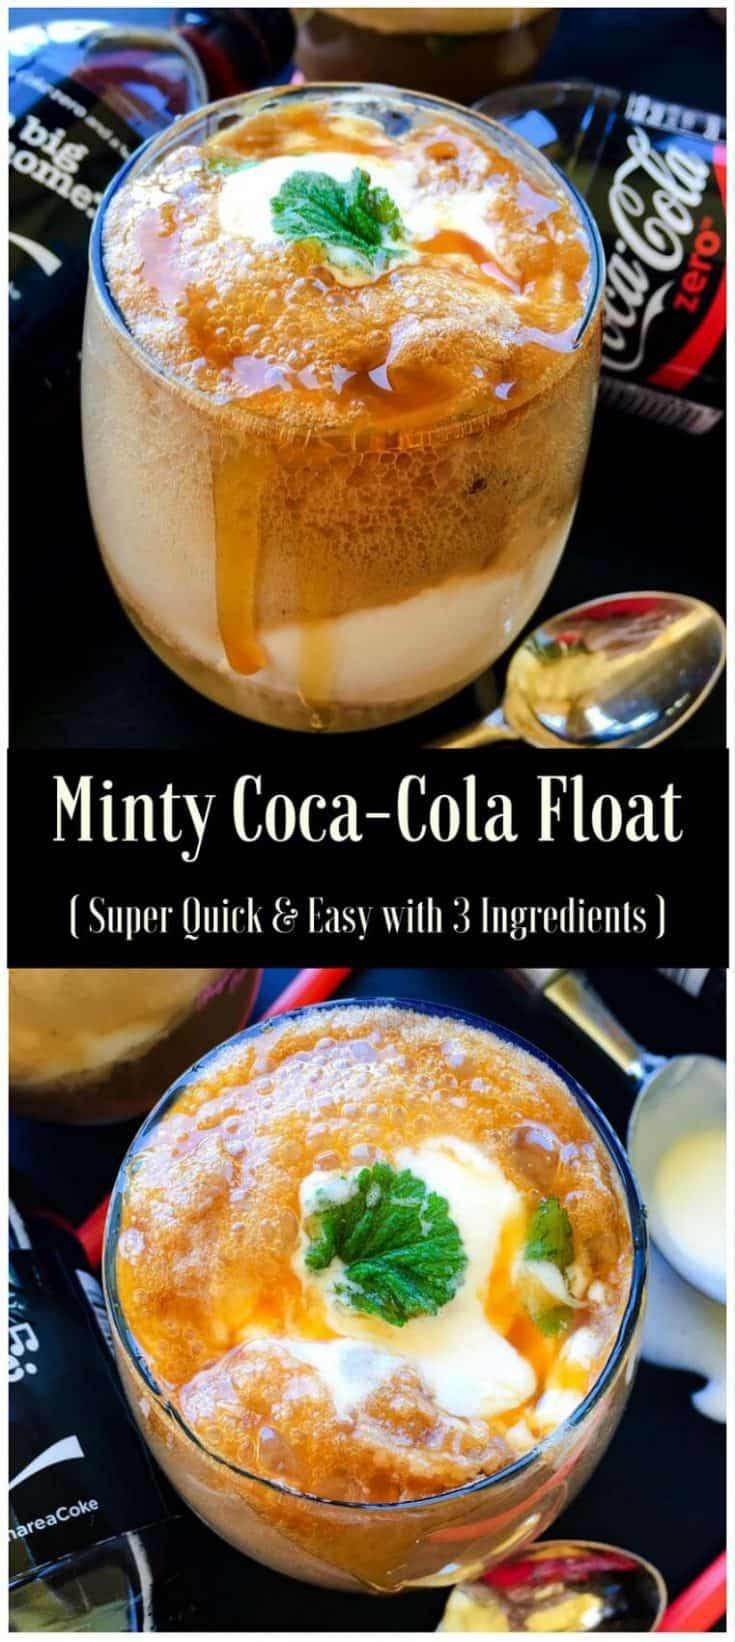 Minty Coca-Cola Float : #ad #ExpressUrSelfie #CollectiveBias #icecream #float #dessert